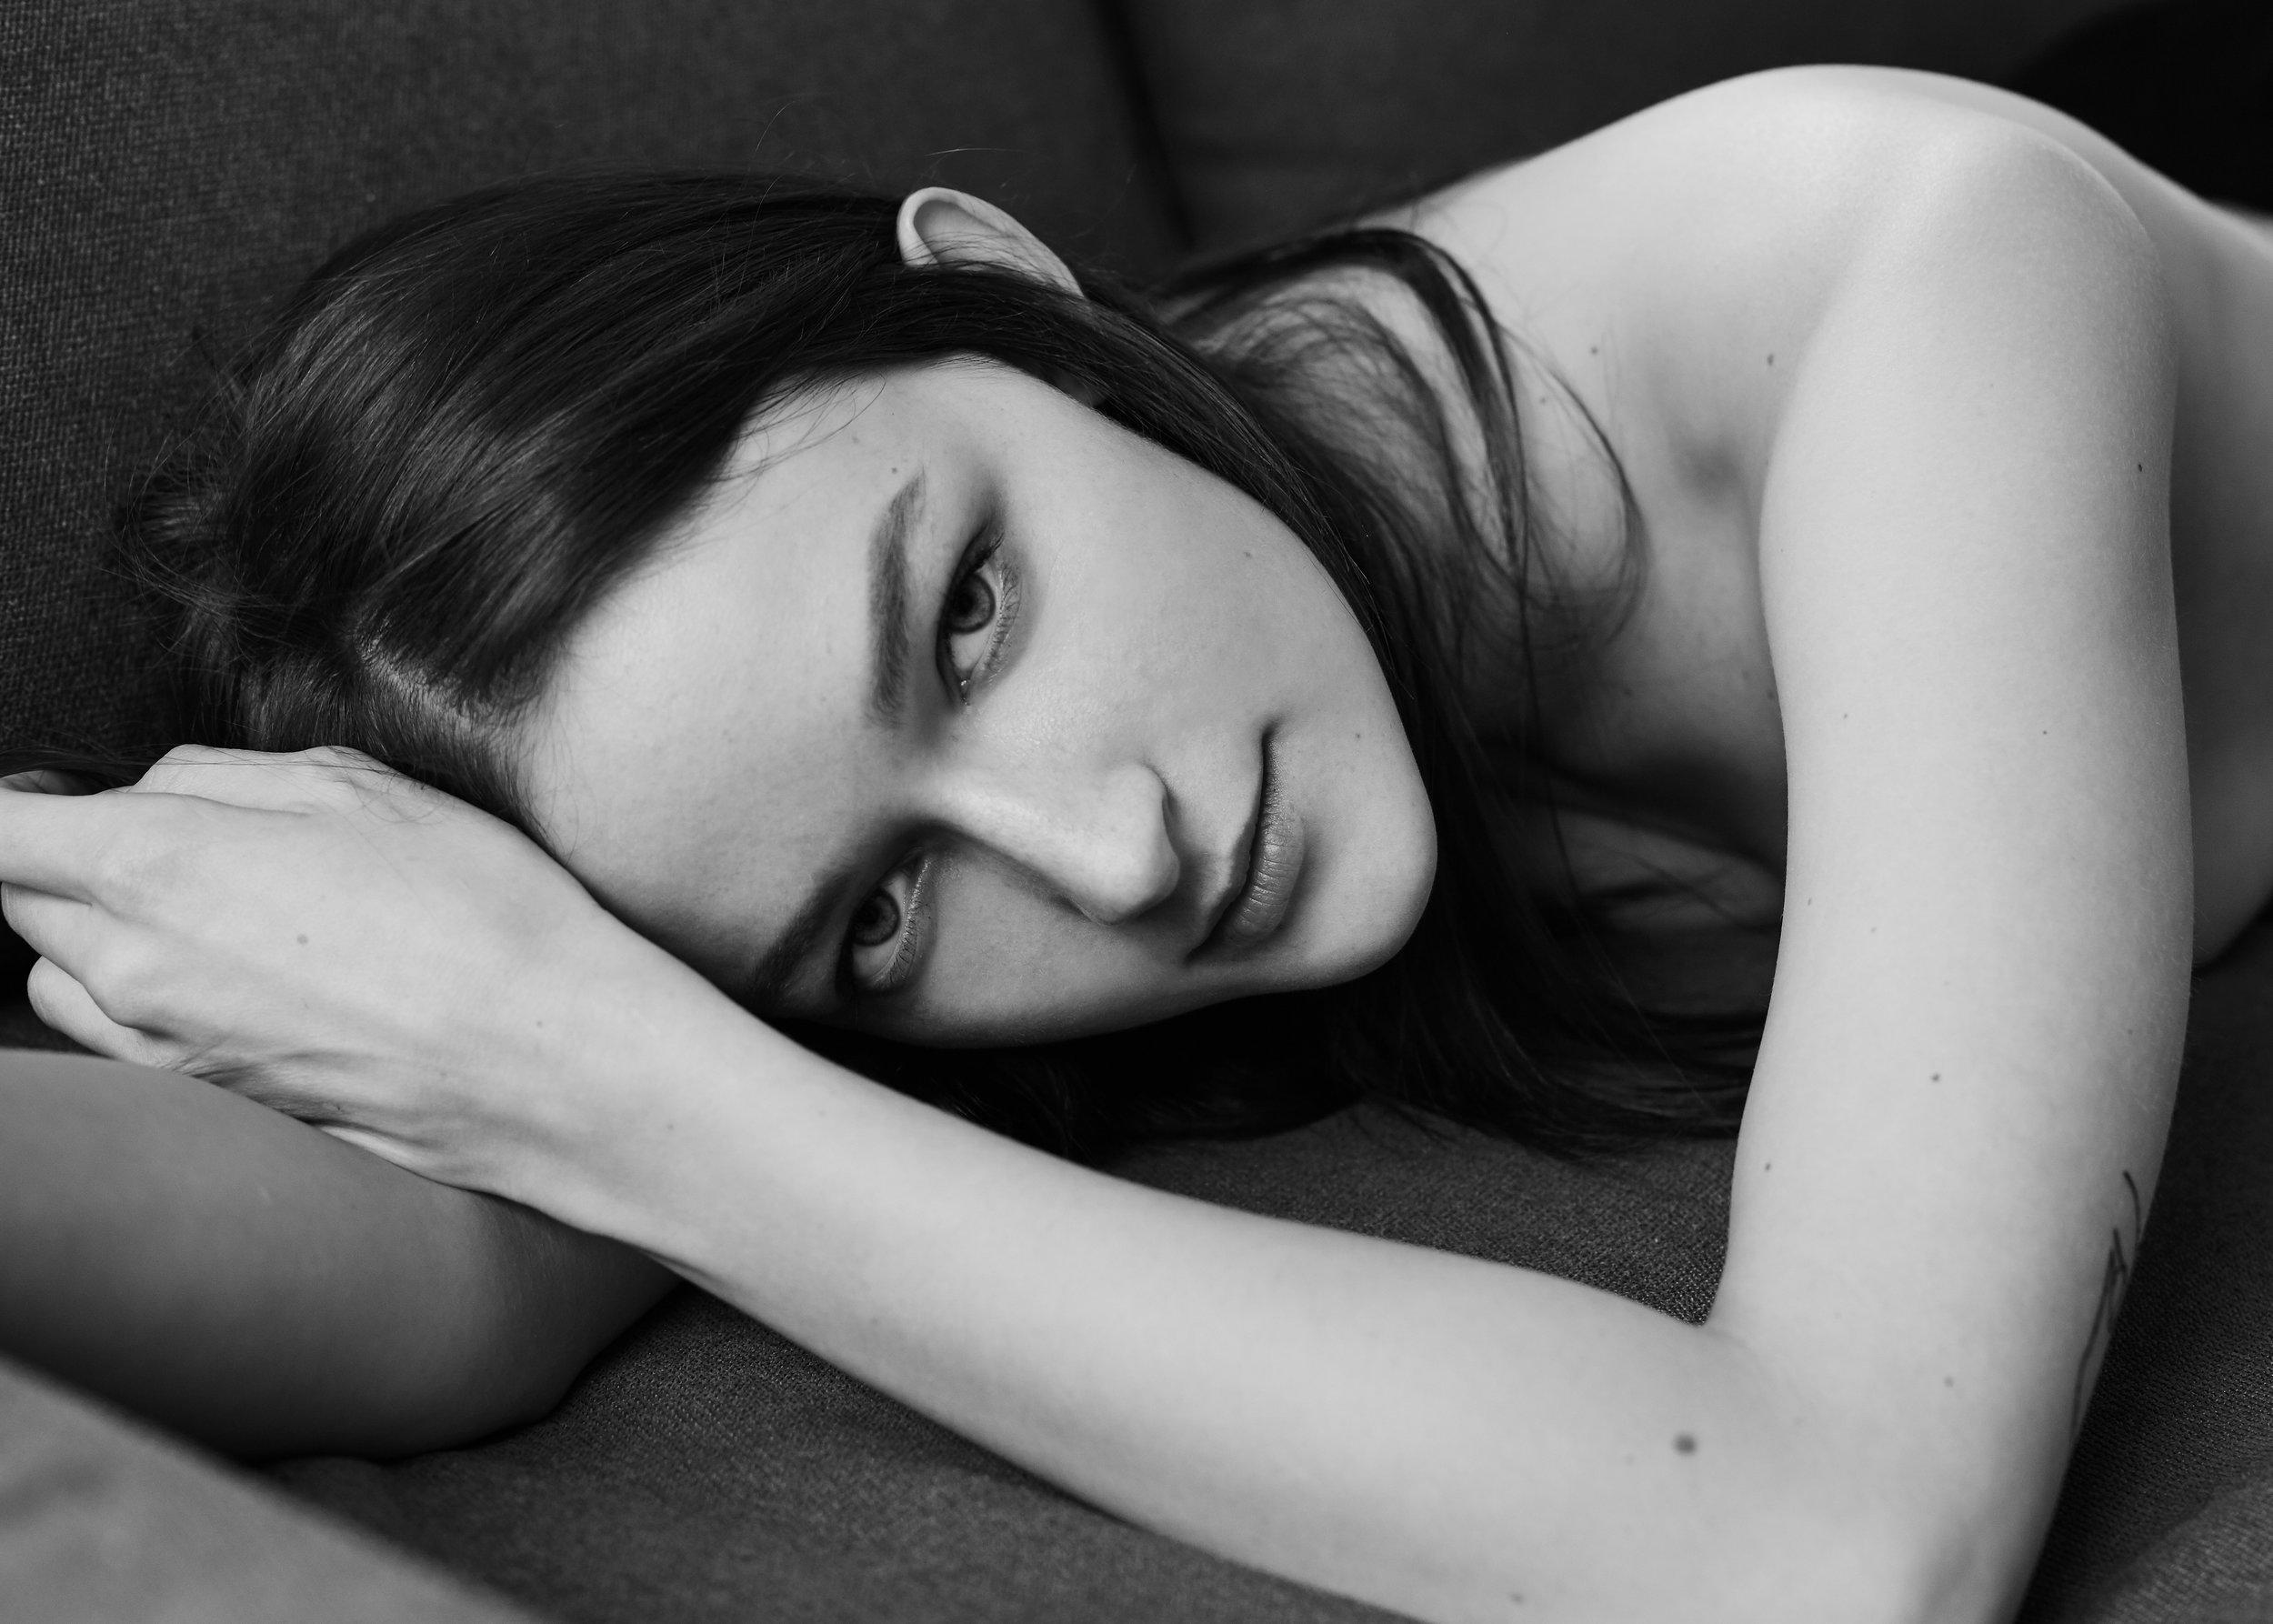 Viktorija / Personal, 2017